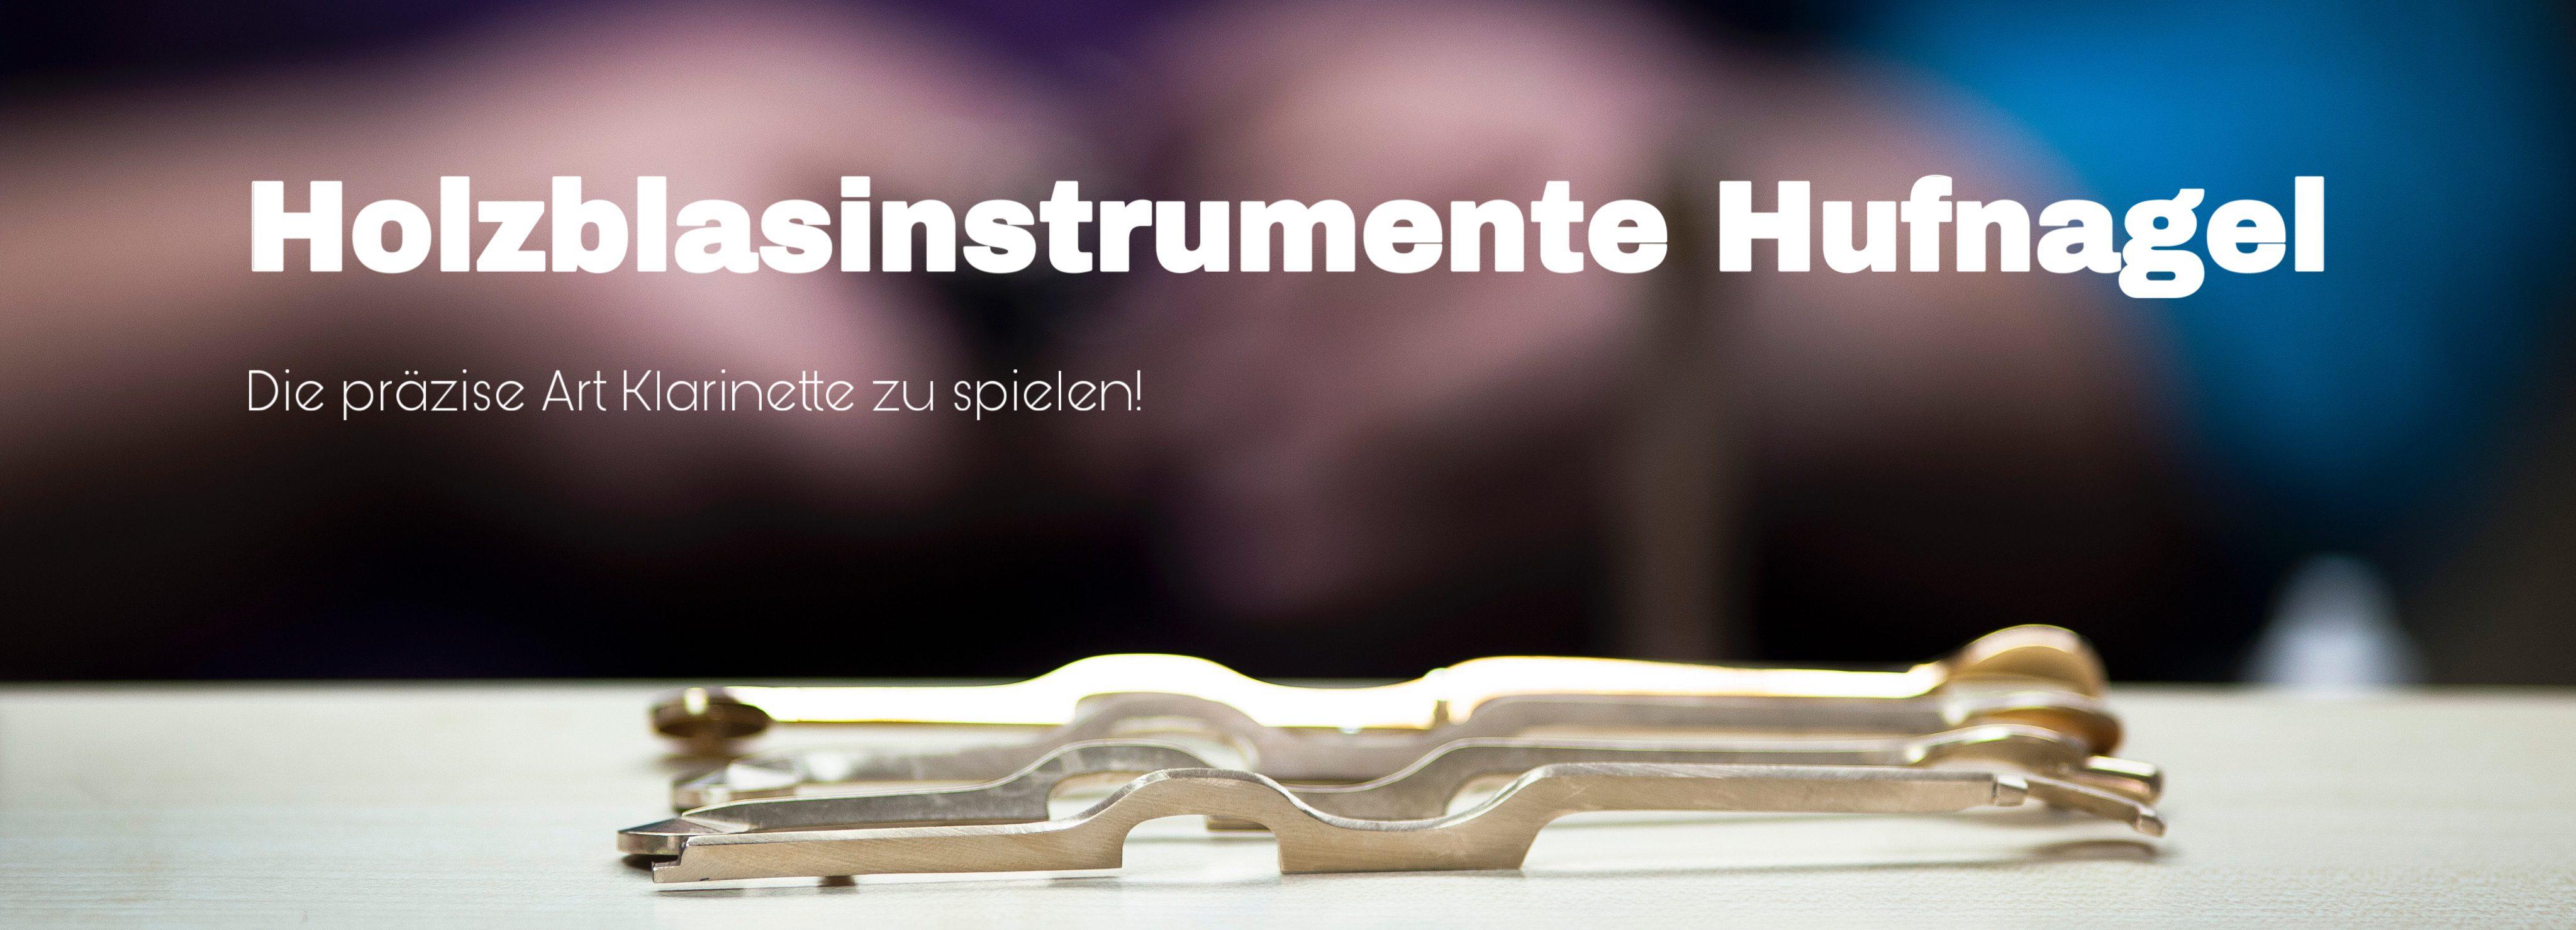 Holzblasinstrumente Hufnagel